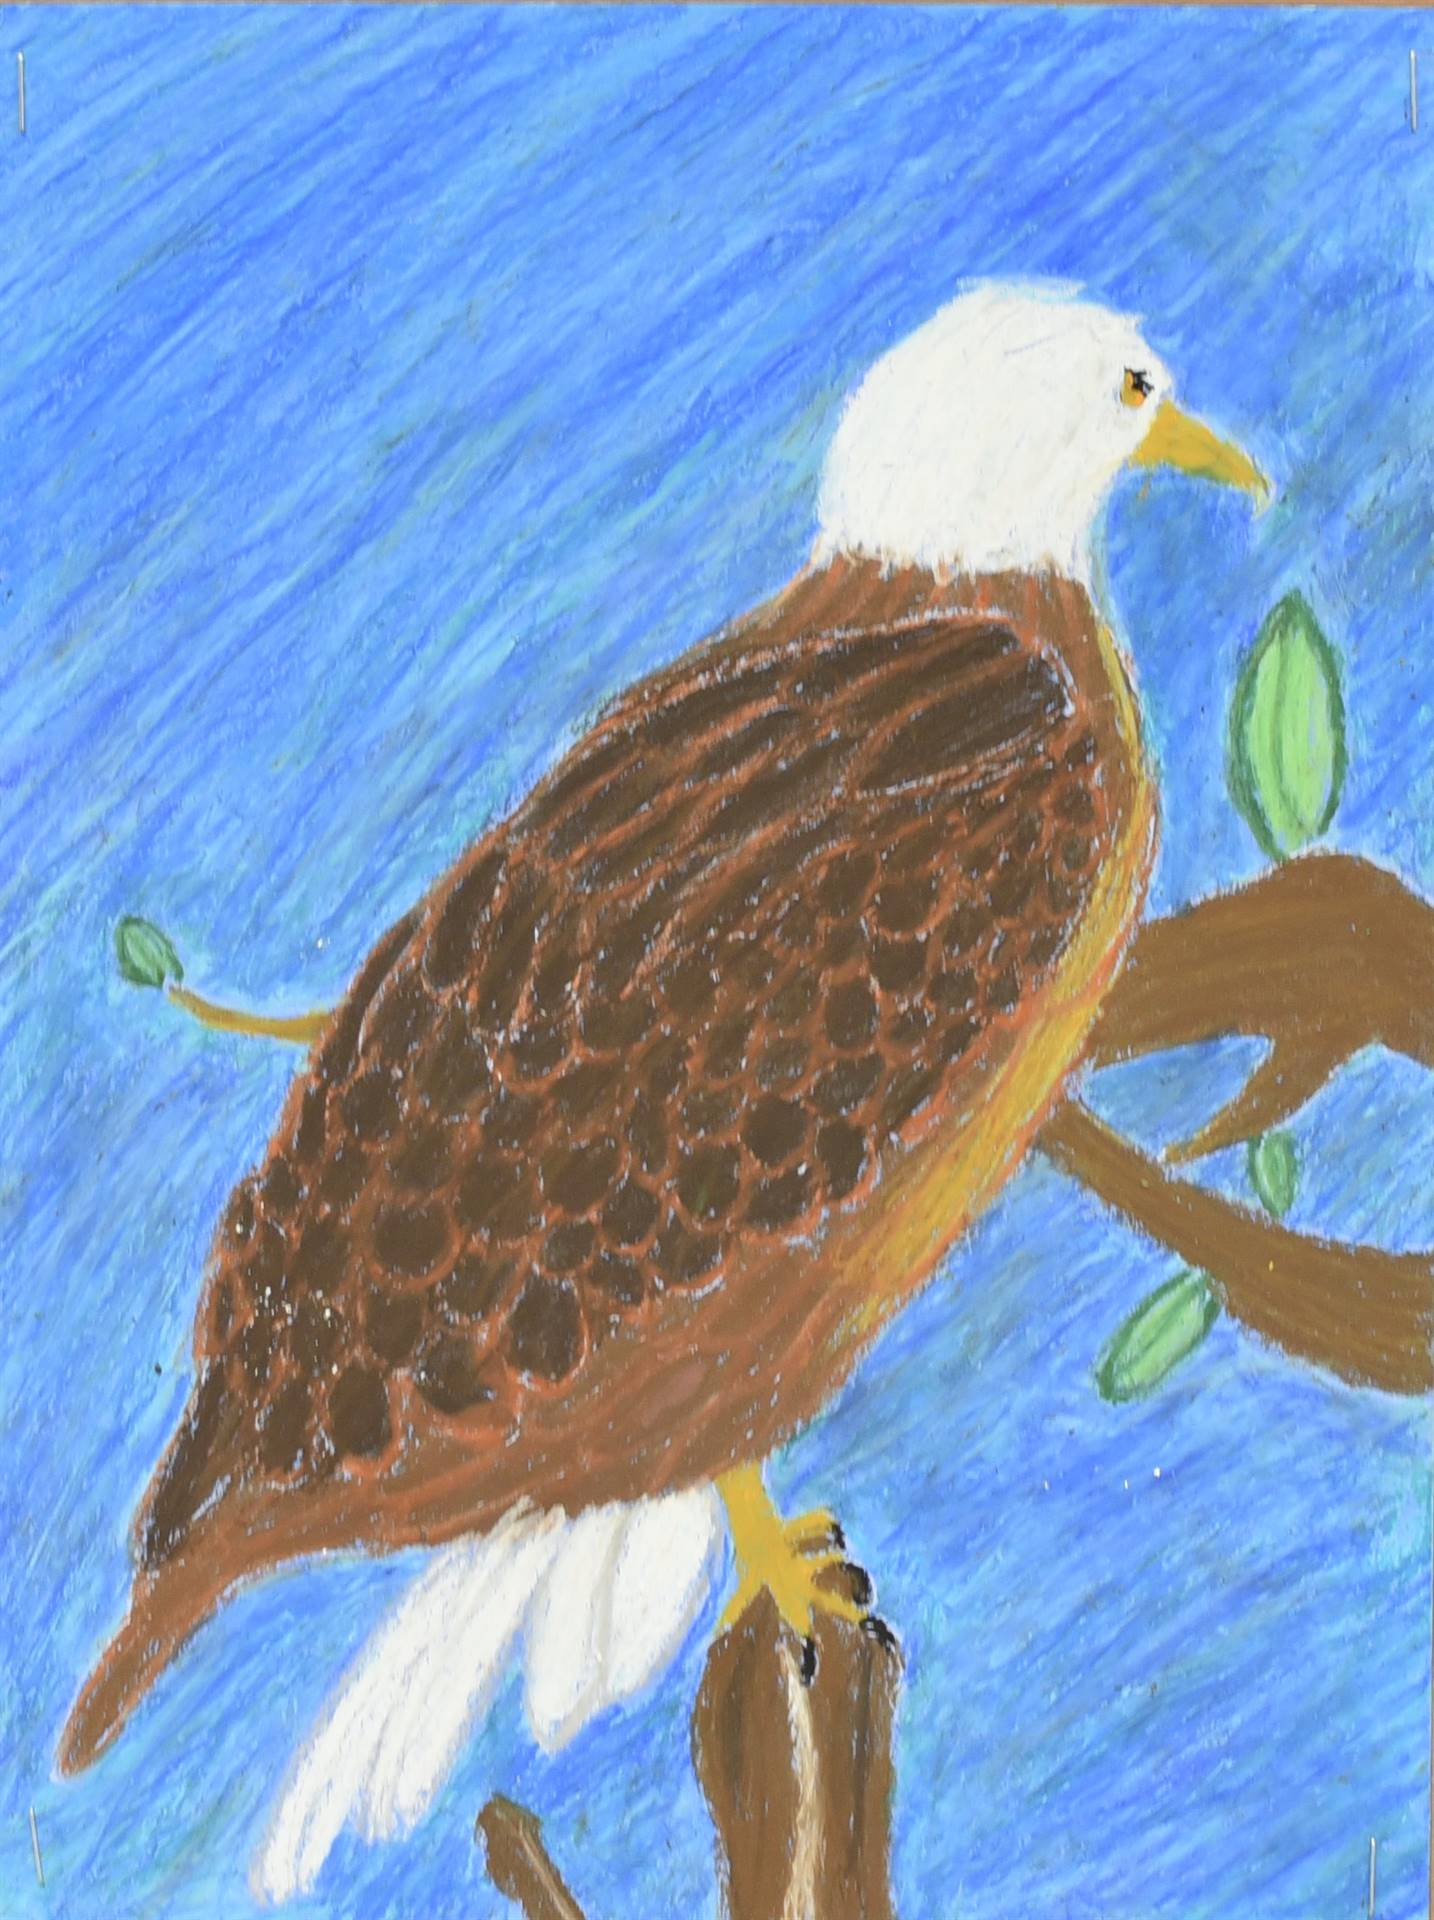 Brecksville-Broadview Hts. Middle School Art Projects 123